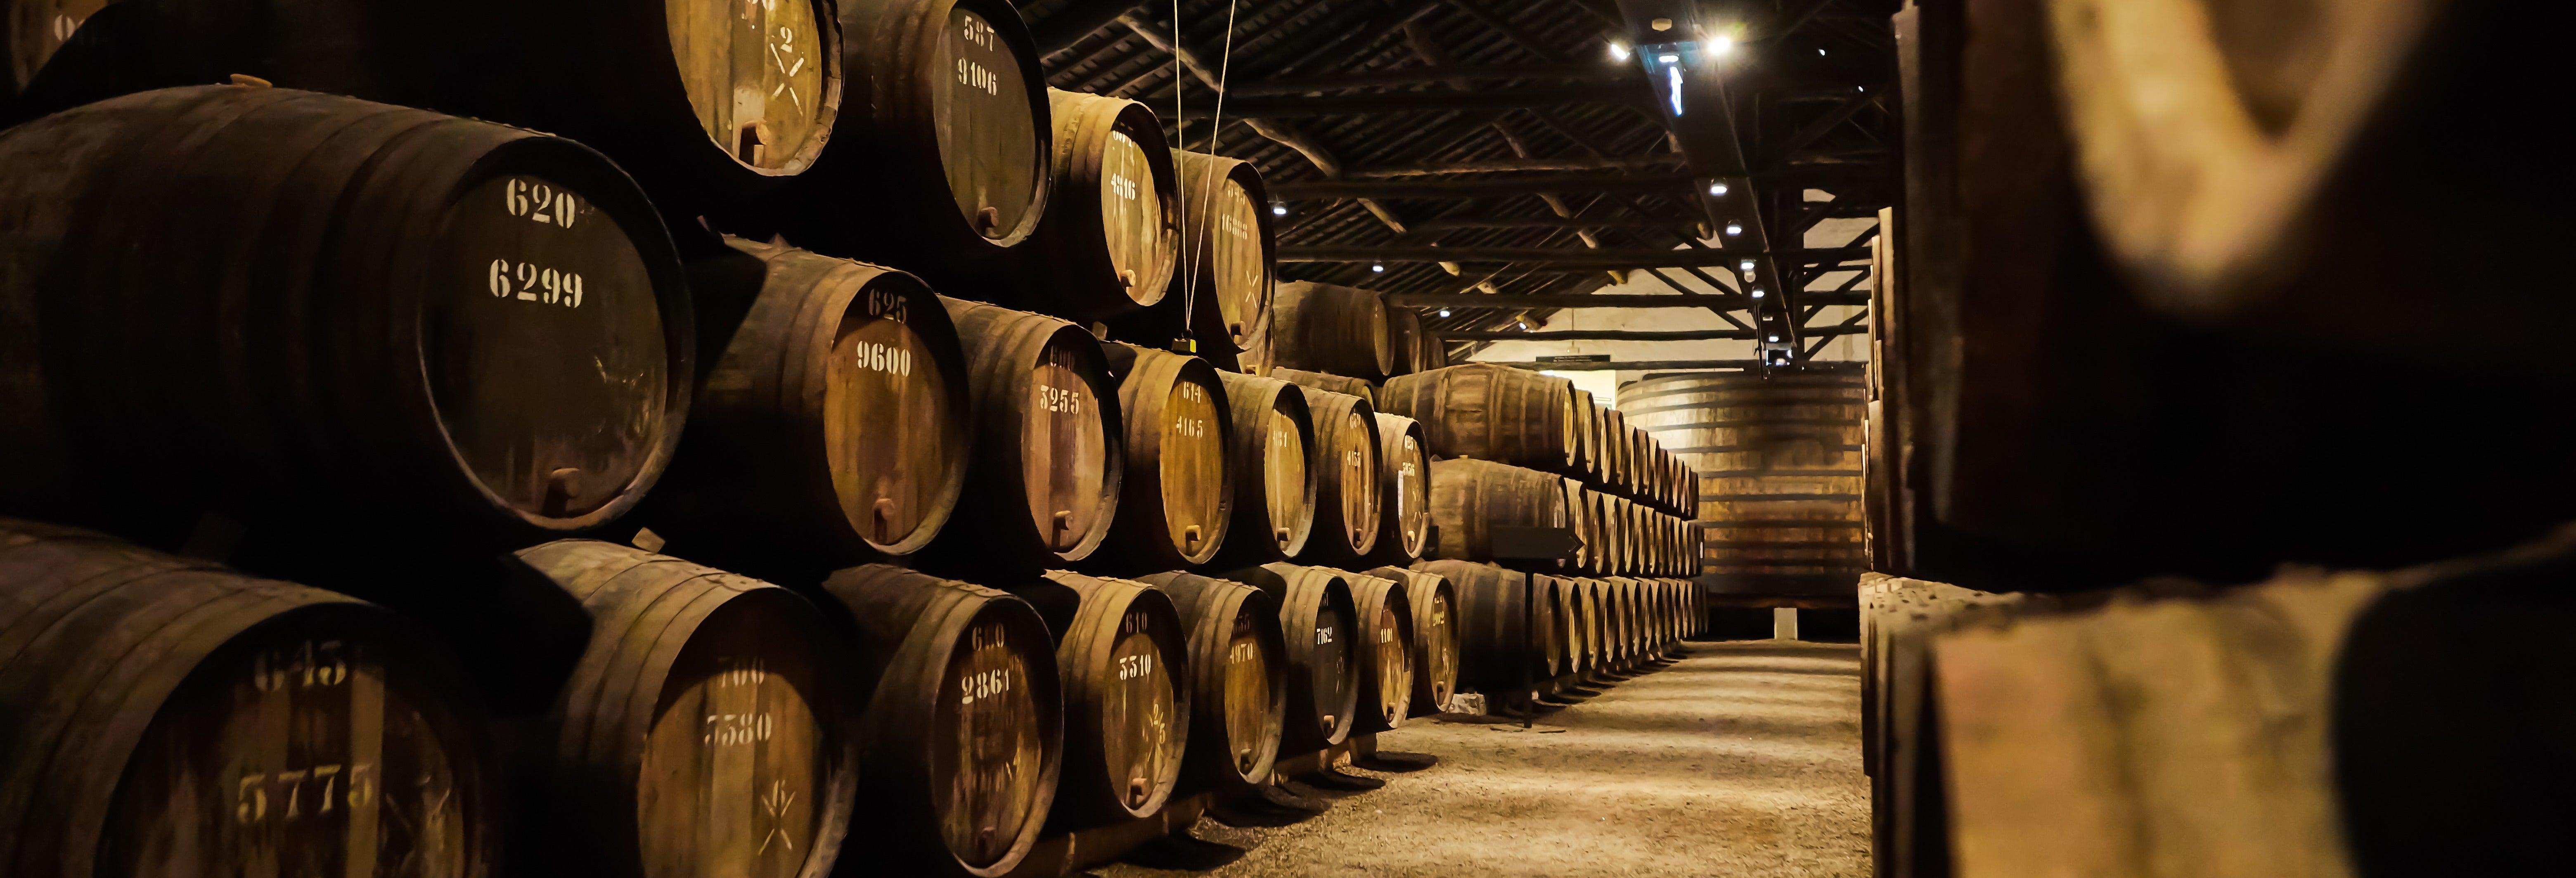 Tour de vinhos + Visita à cave Fonseca